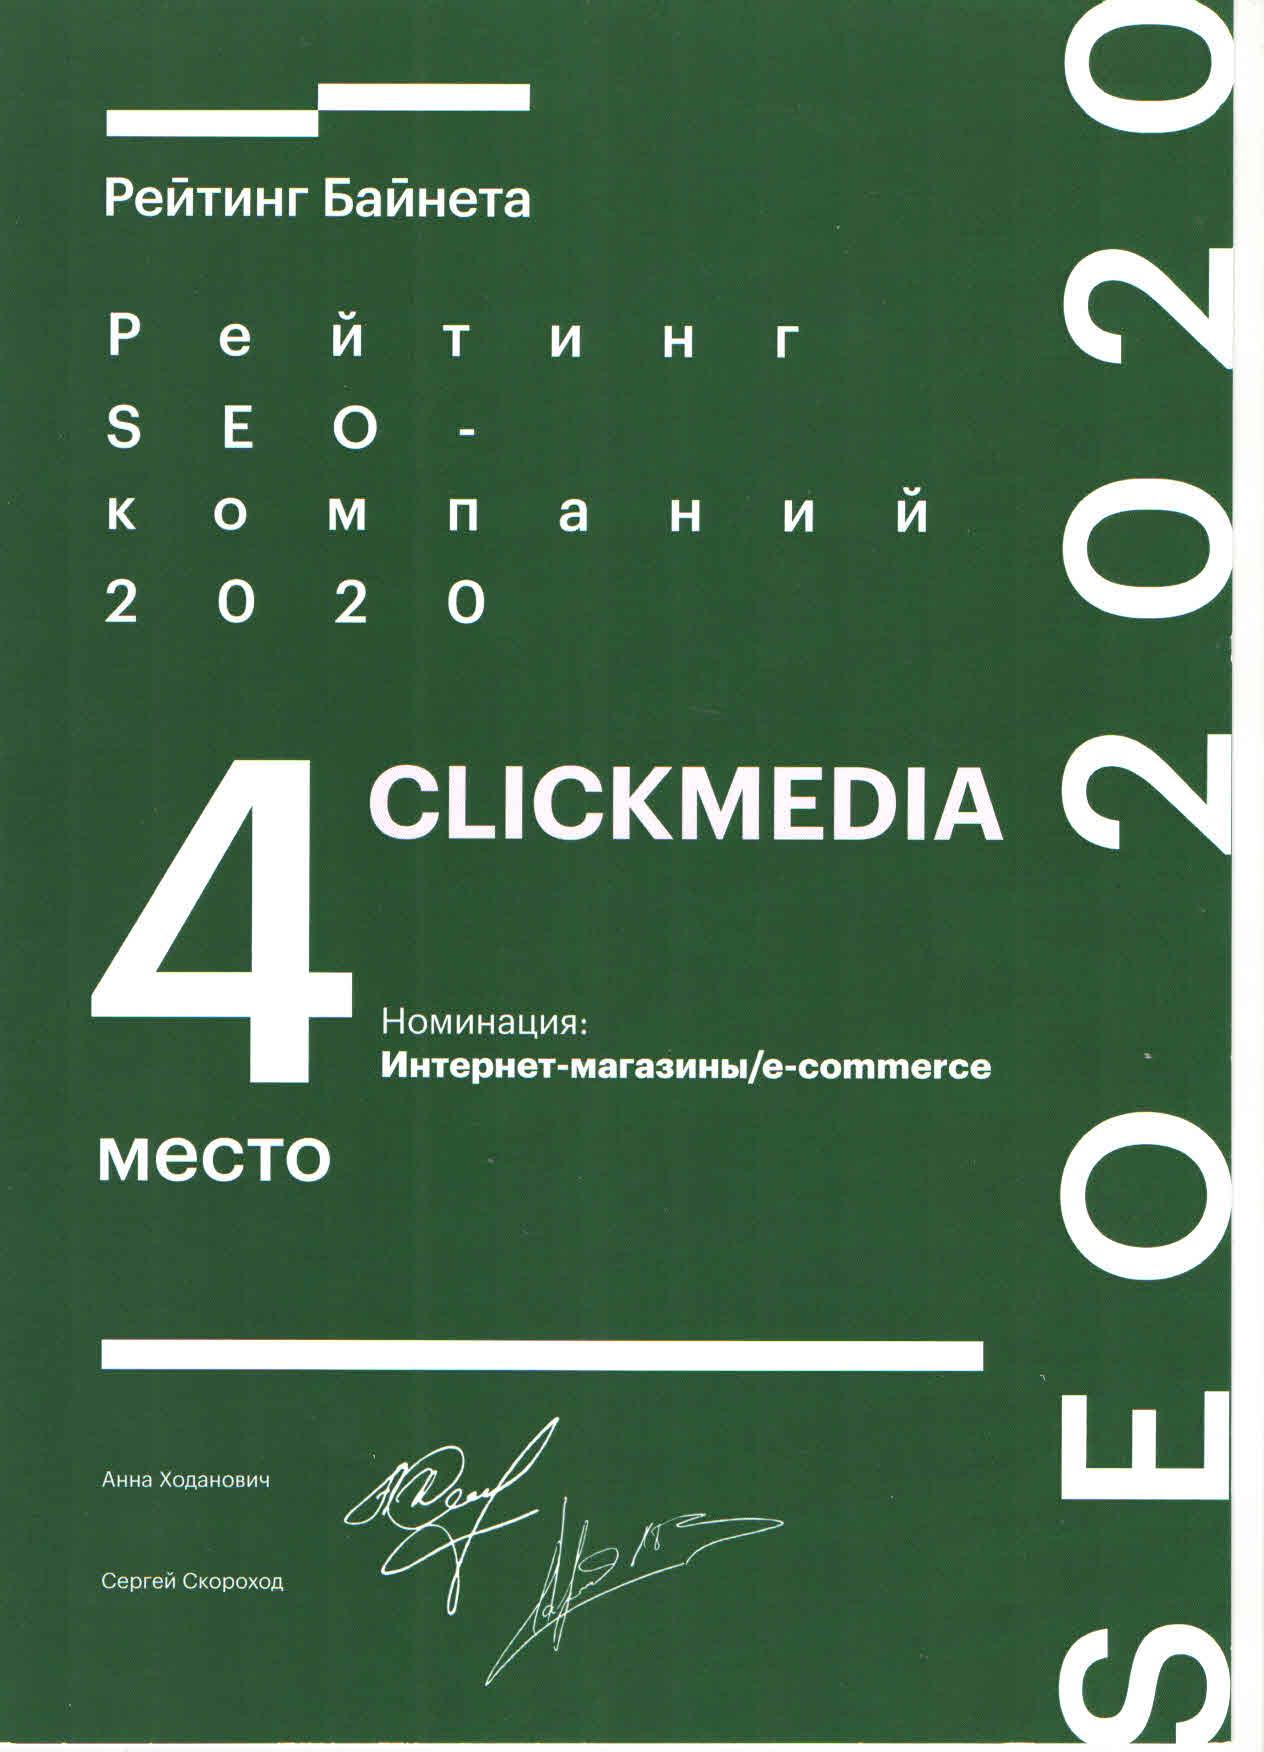 <b>4-е место</b> в рейтинге SEO-компаний Беларуси.<br>Номинация:<br><b>Интернет-магазины/e-commerce</b>